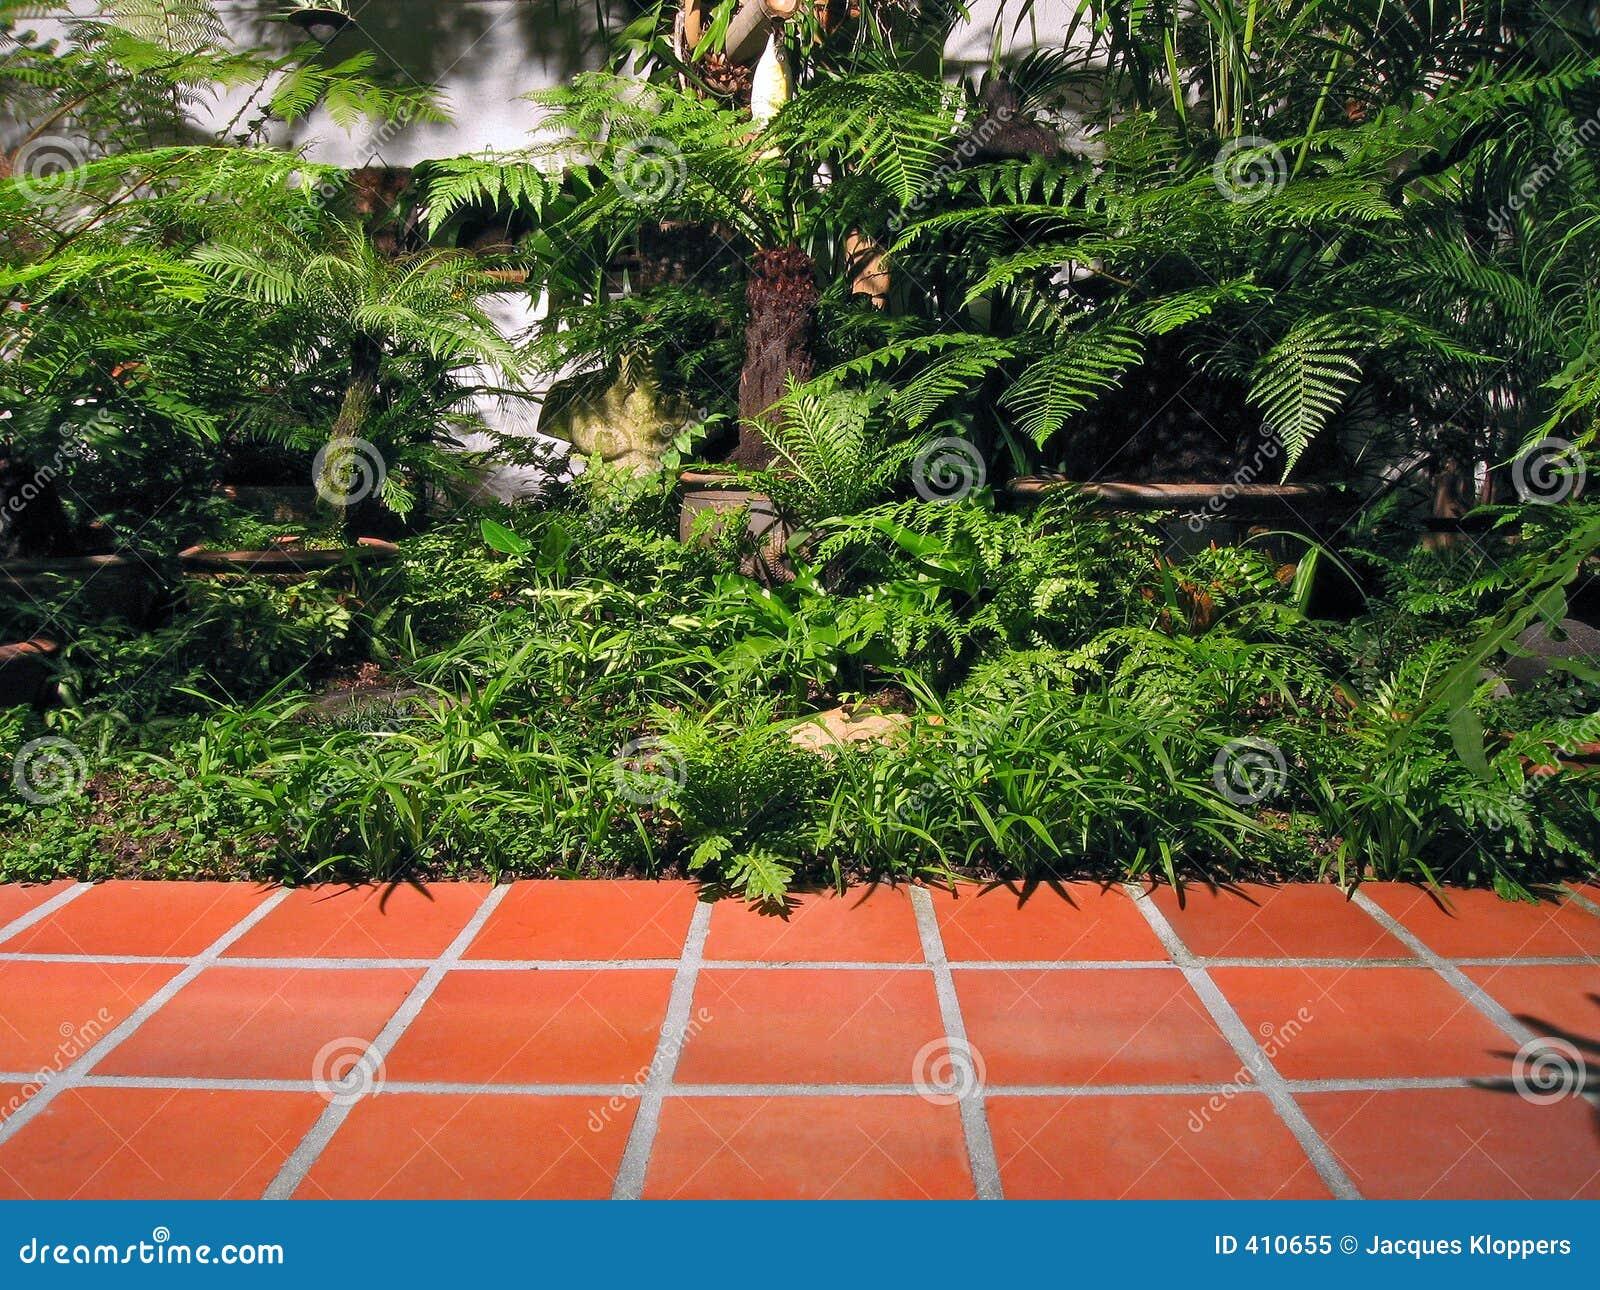 fotos de jardim tropical : fotos de jardim tropical:Foto de Stock Royalty Free: Jardim urbano tropical pequeno